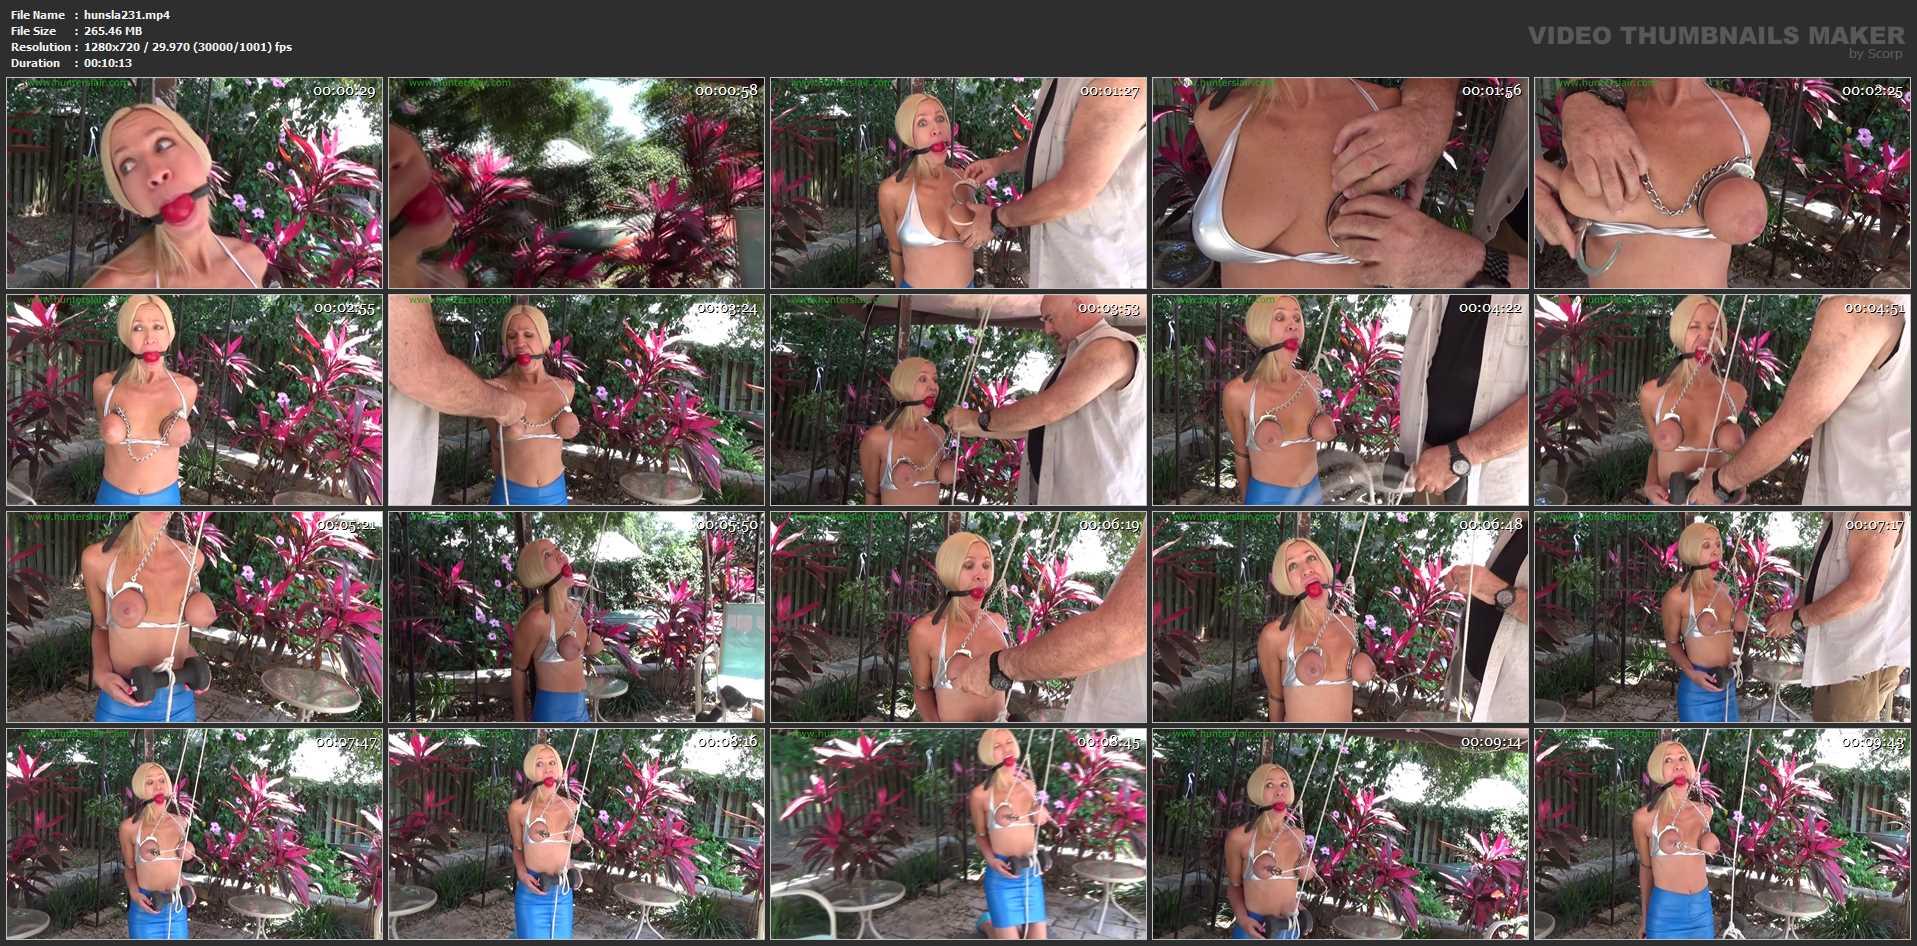 [HUNTERSLAIR] Breast bound predicament in the garden. Featuring: Amanda Foxx [HD][720p][MP4]